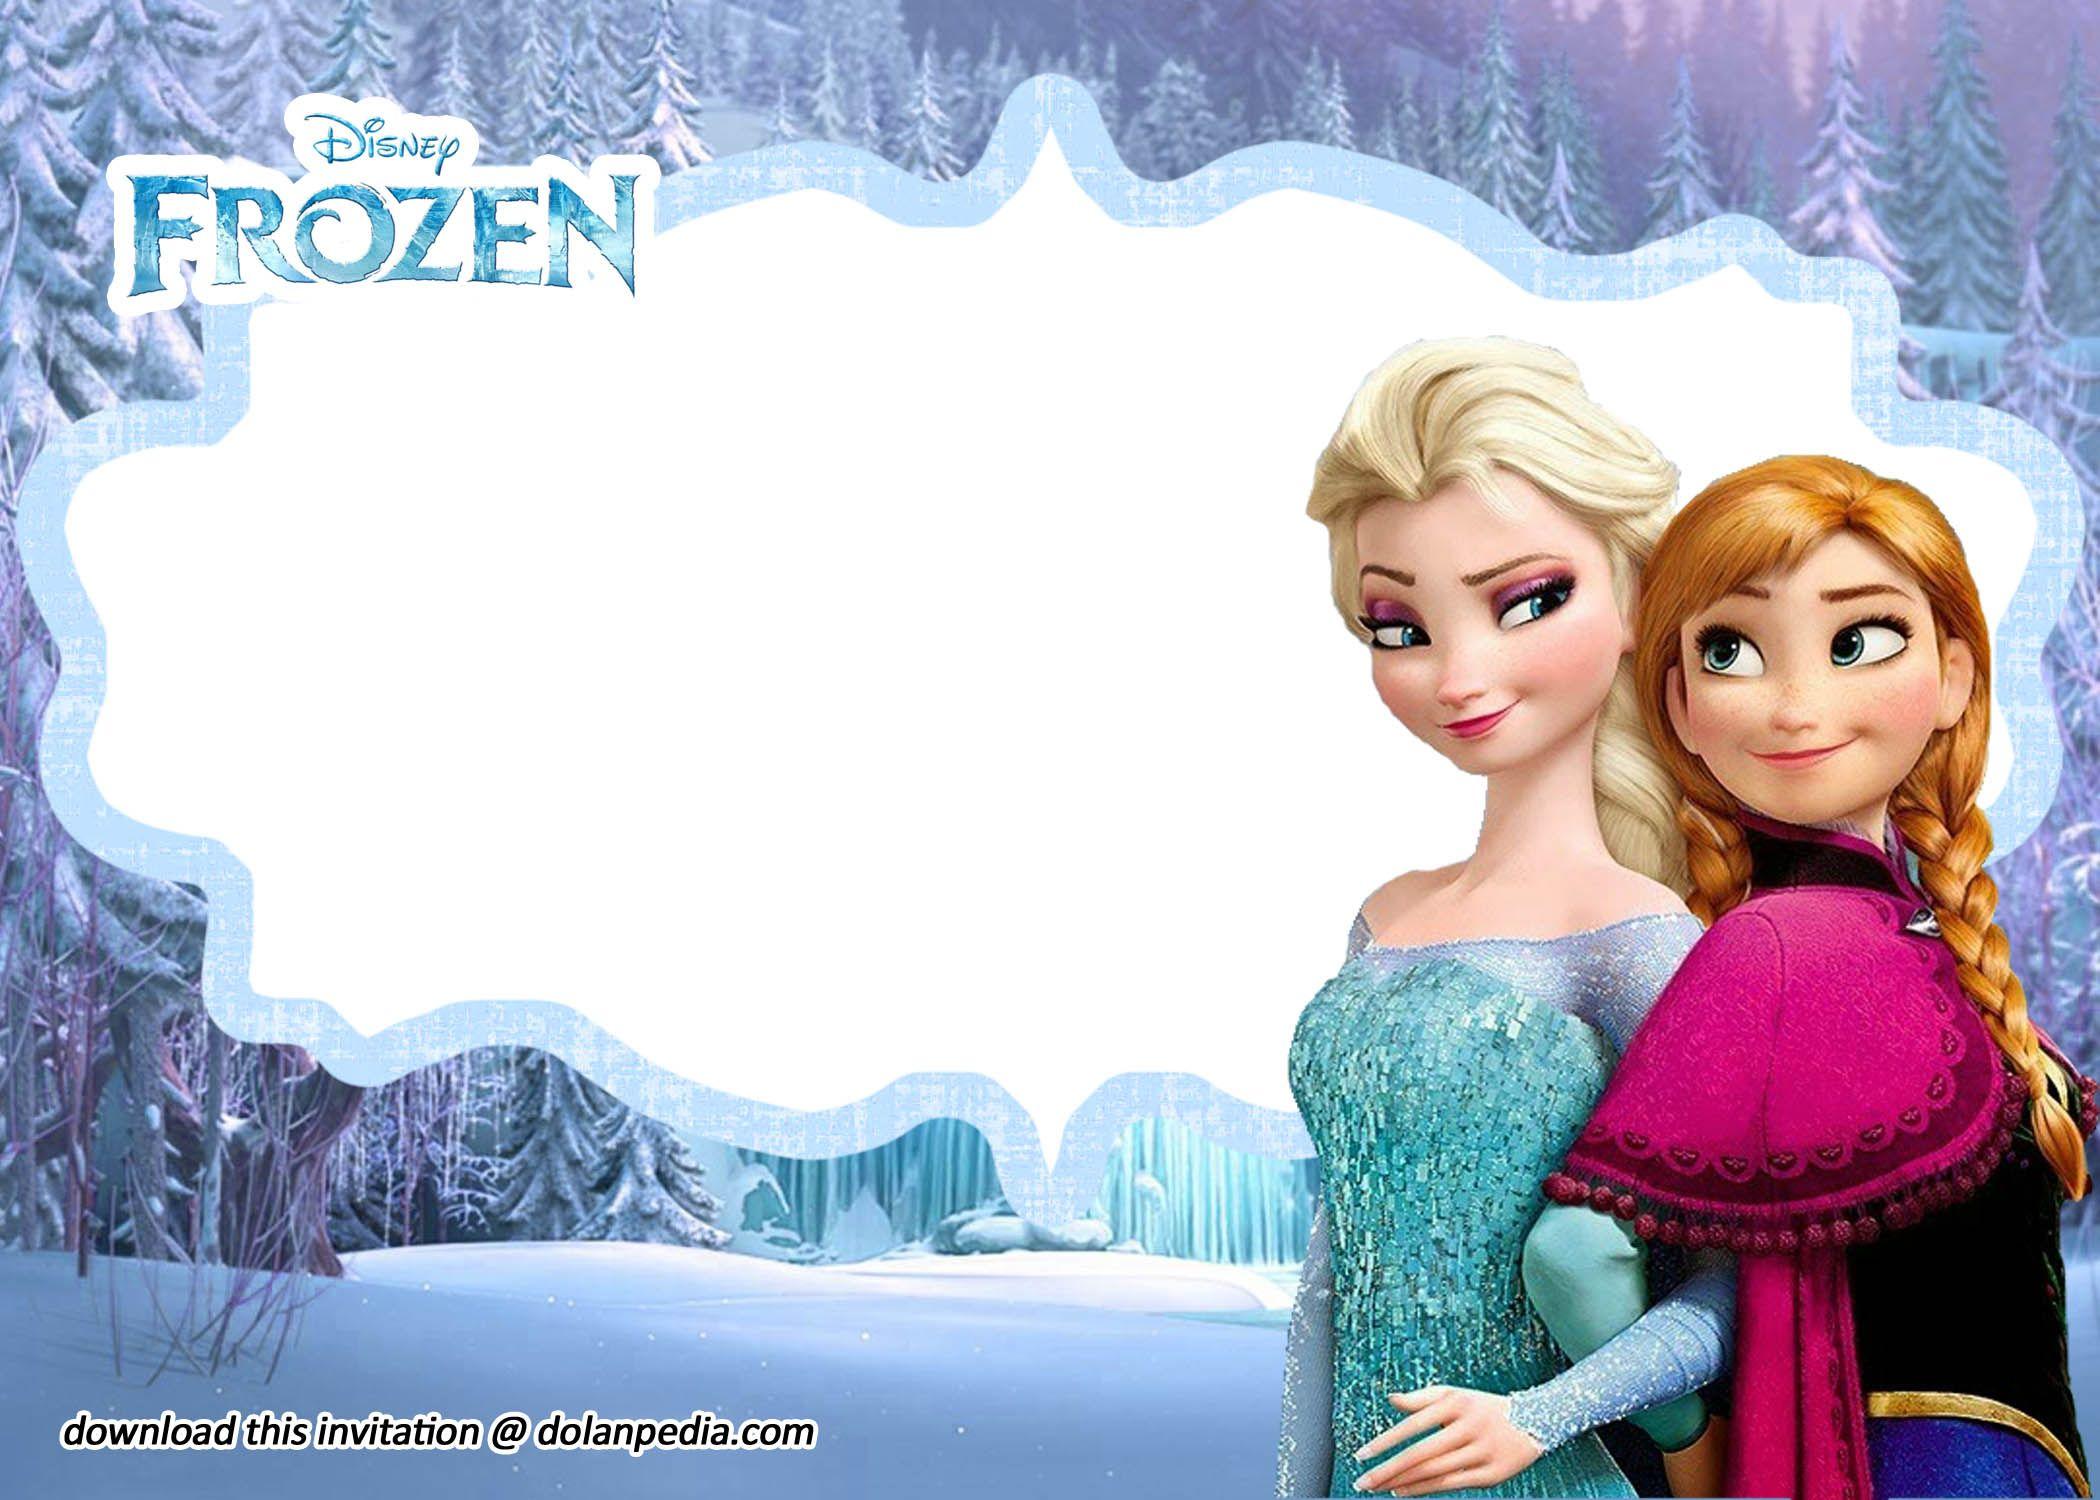 Free Printable Disney Frozen Invitation Templates Frozen Invitations Disney Frozen Invitations Frozen Invitation Template